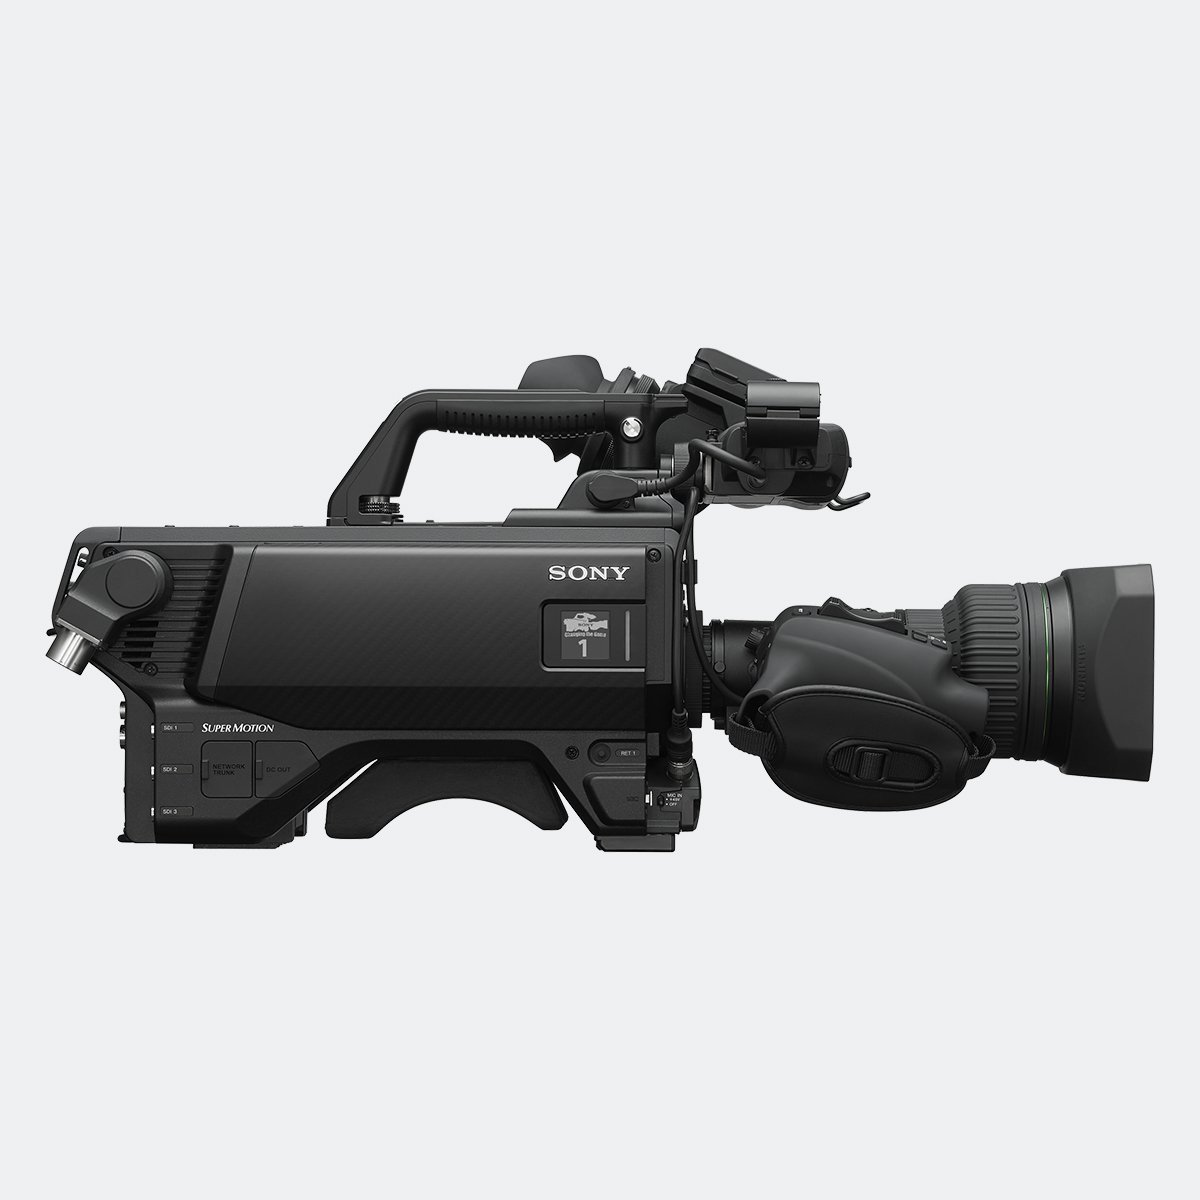 Sony HDC-5500 Multi-Format 4K/HD Camera System